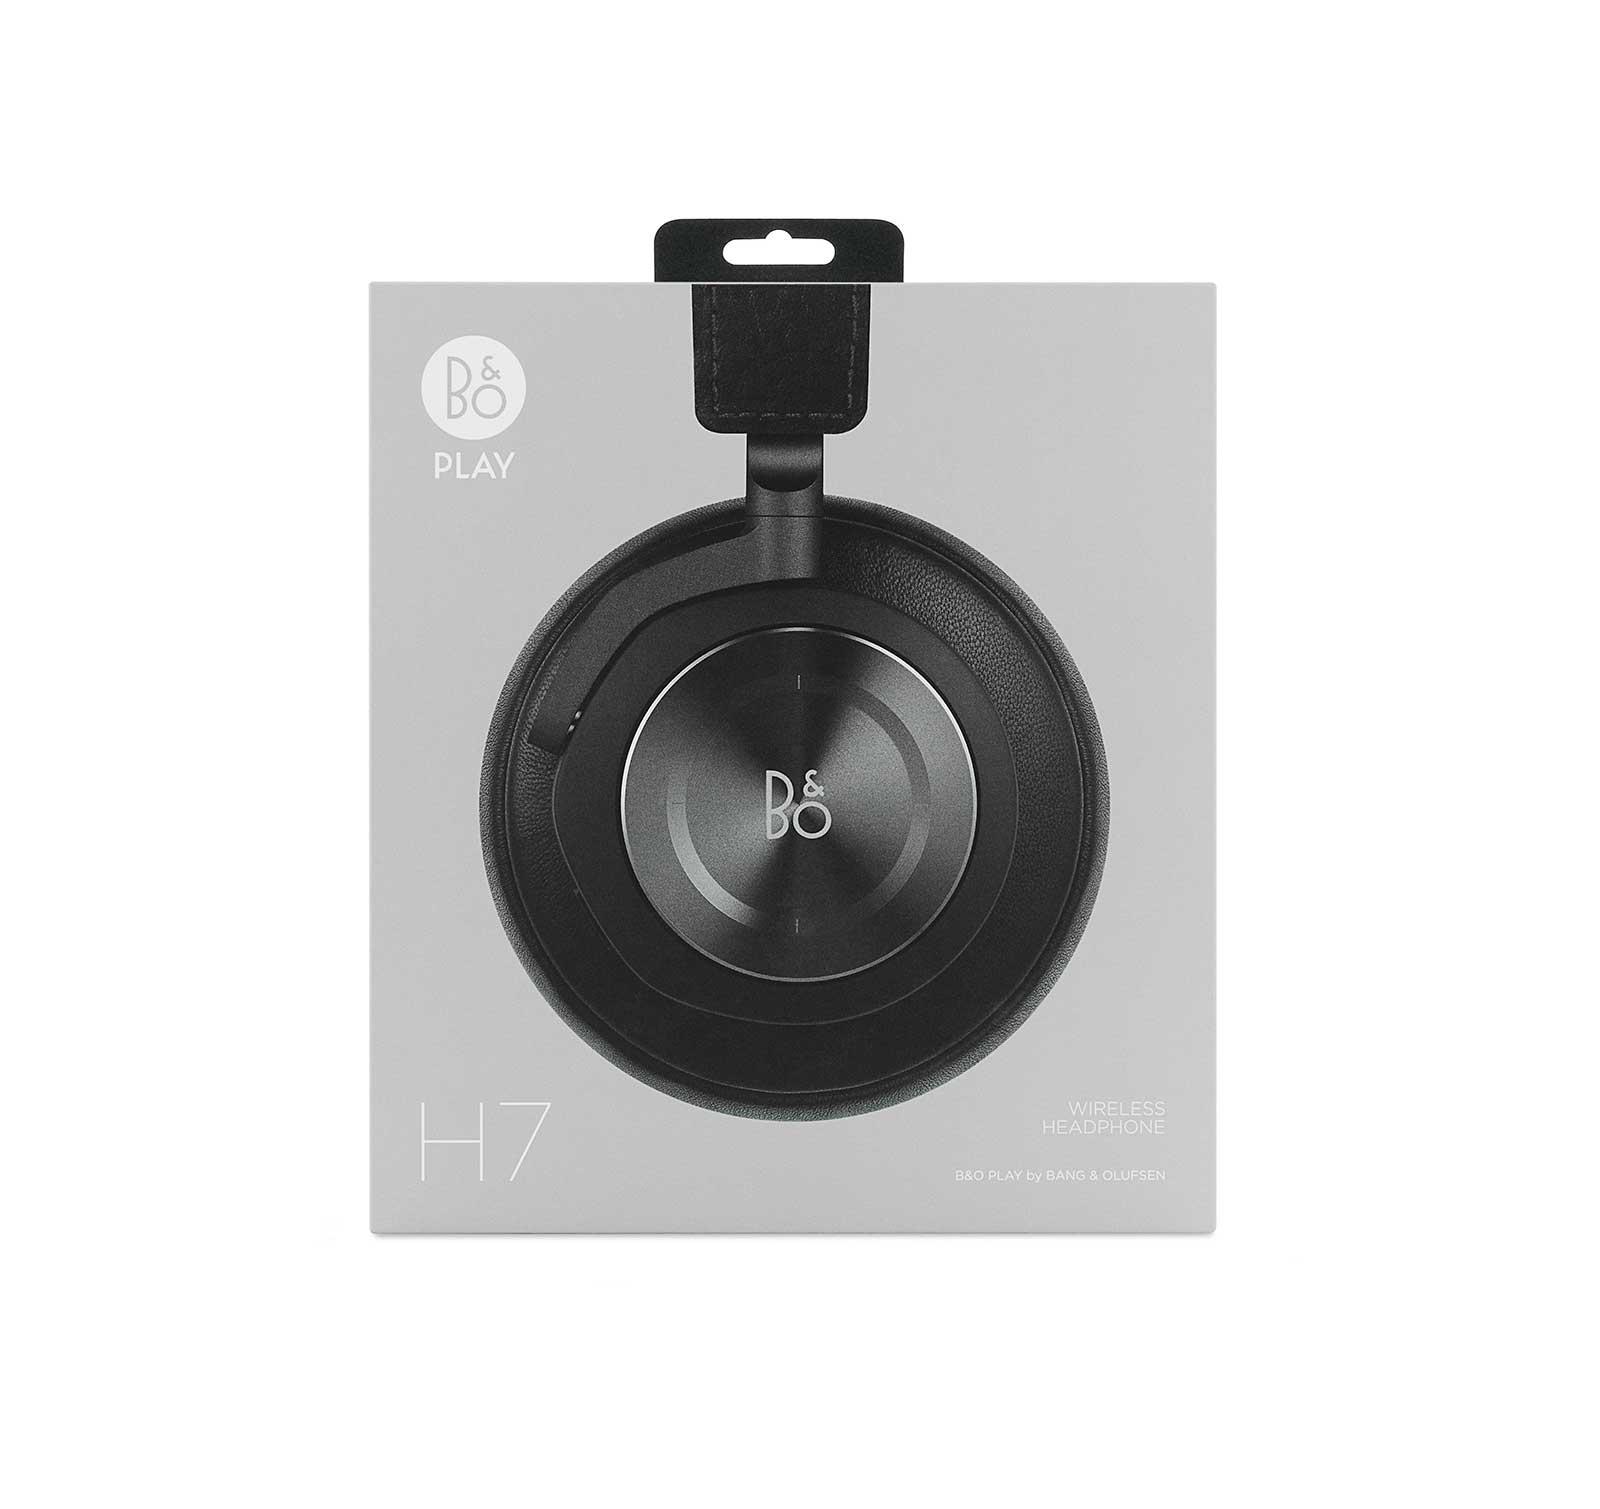 796d521c79645d B&O Play Beoplay H7 Black Wireless Over-ear Headphones - Walmart.com